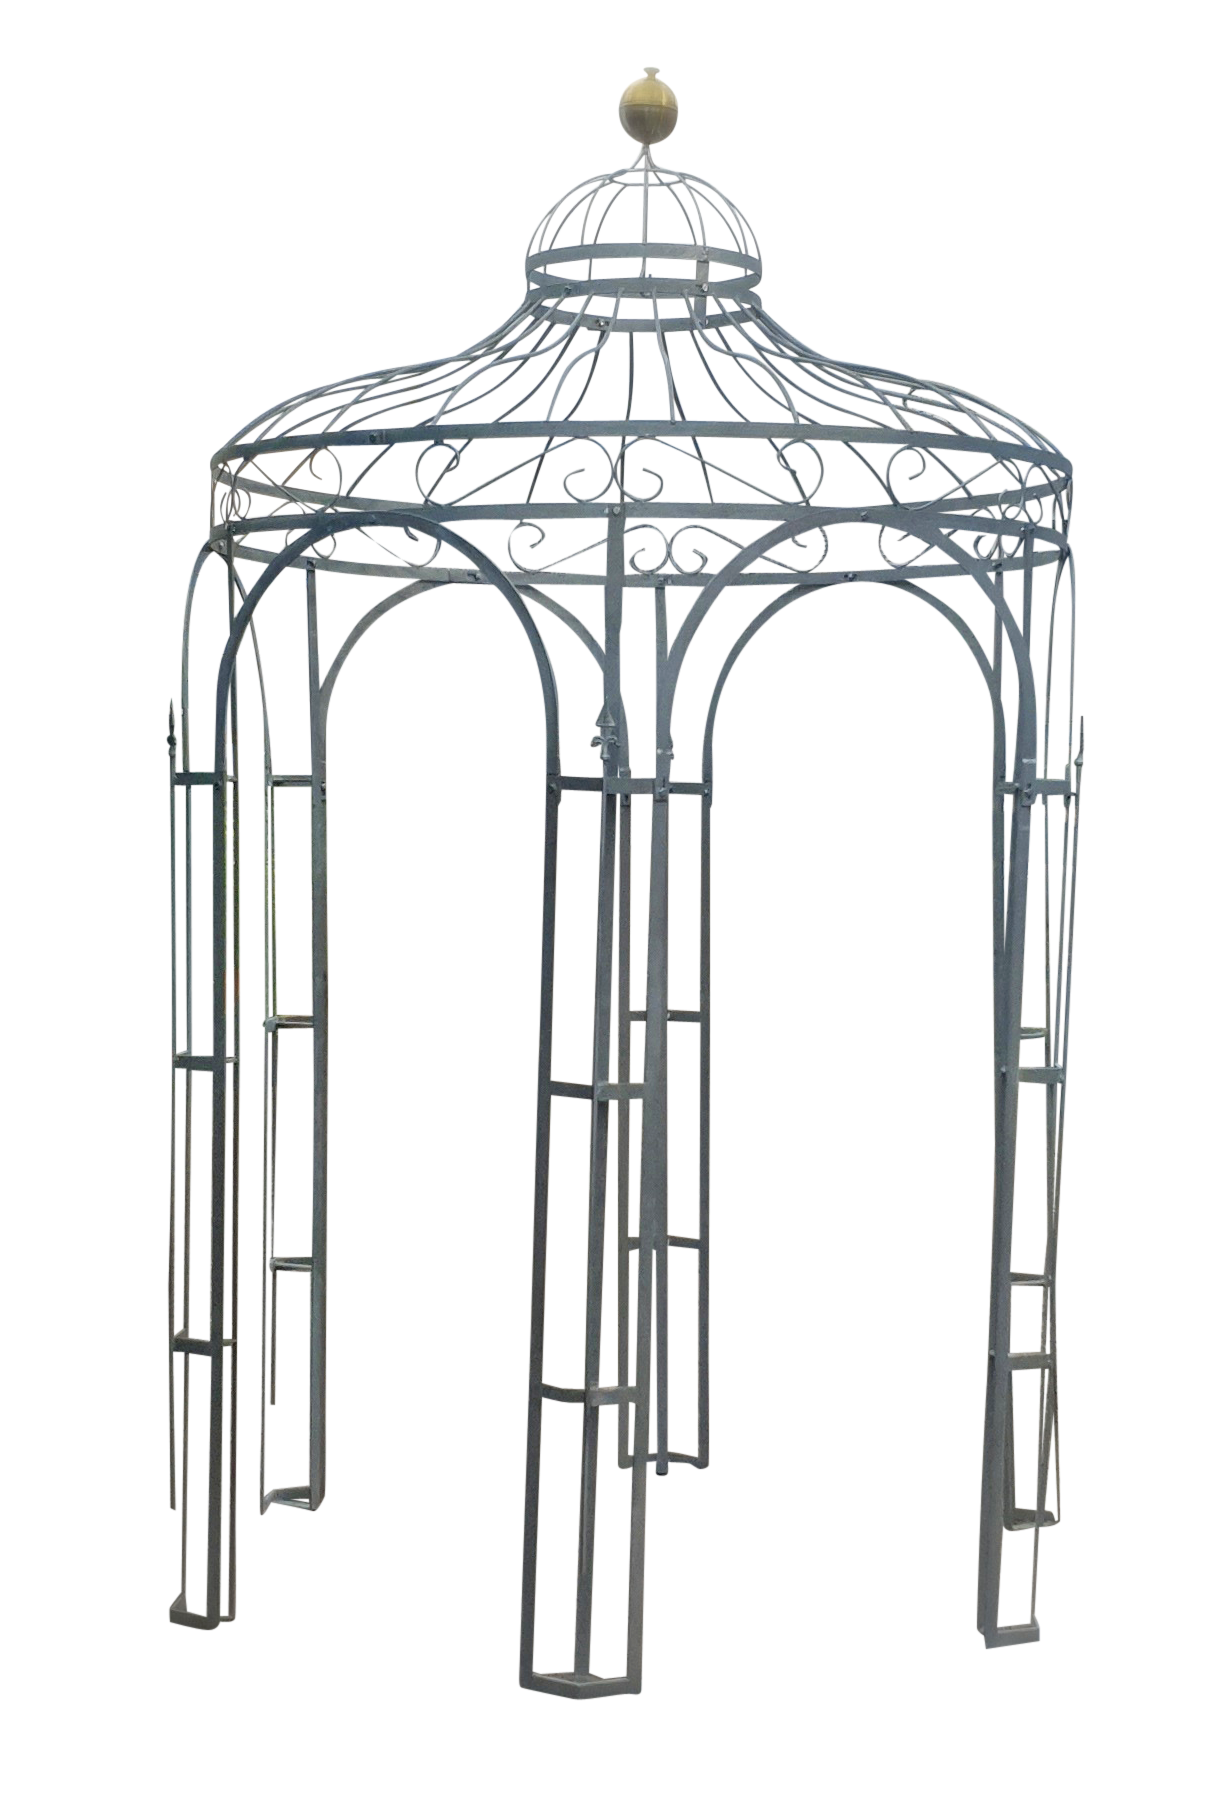 Full Size of Gartenpavillon Metall Glas Wasserdicht Rund 3 X 5 Pavillon Schweiz Toom Baumarkt Eleganz Regale Regal Bett Weiß Wohnzimmer Gartenpavillon Metall